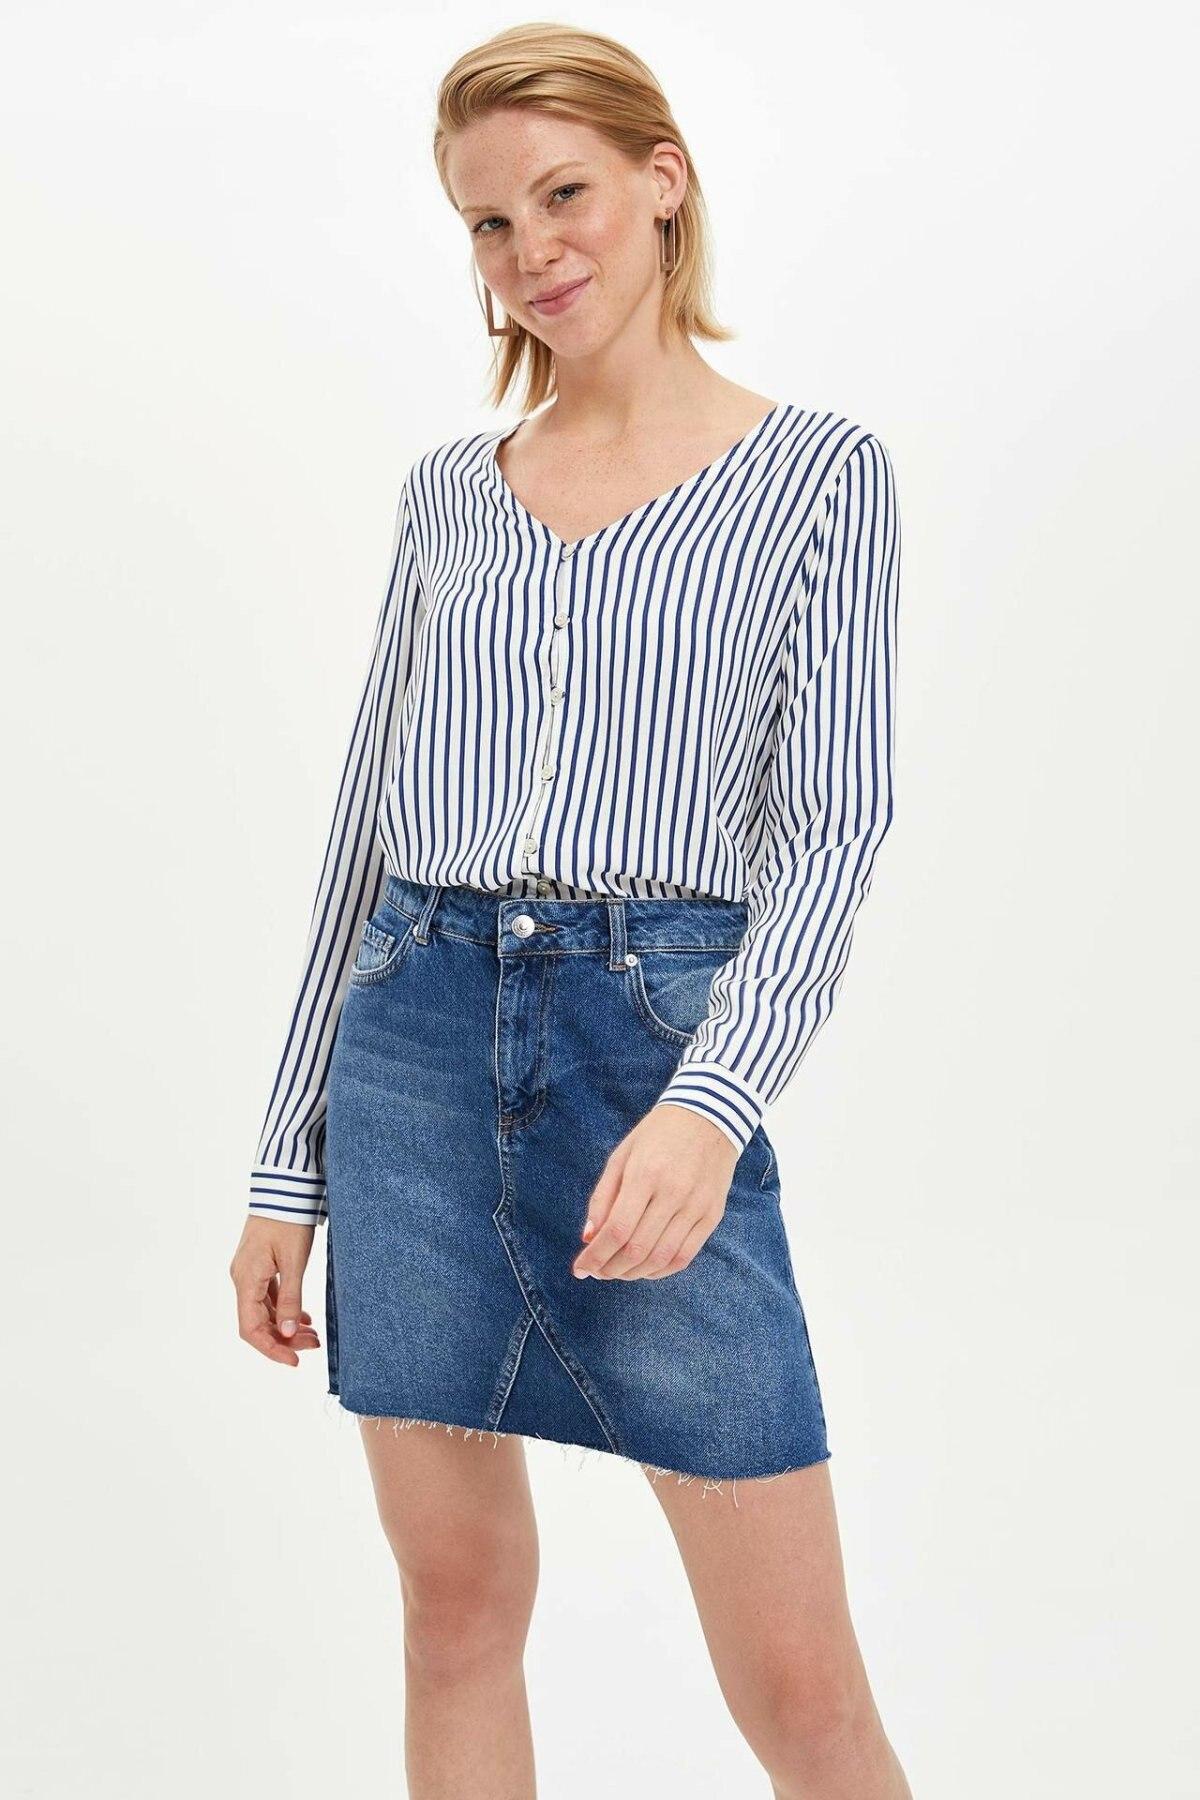 DeFacto Fashion Woman Denim Skirt Female Casual Pockets A-line Skirts Comfort High Quality Ladies Shorts Summer - L3592AZ19AU